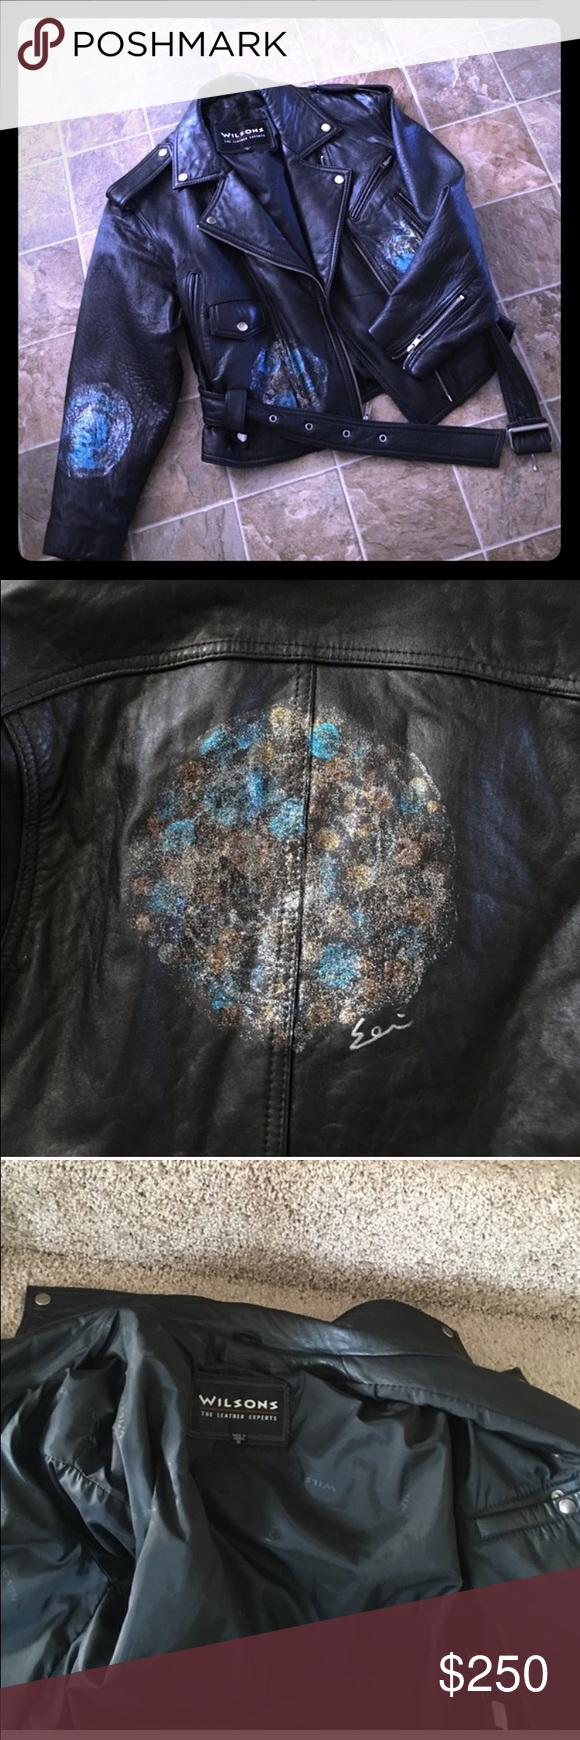 Wilson's Leather Jacket M. Julian size Large Leather